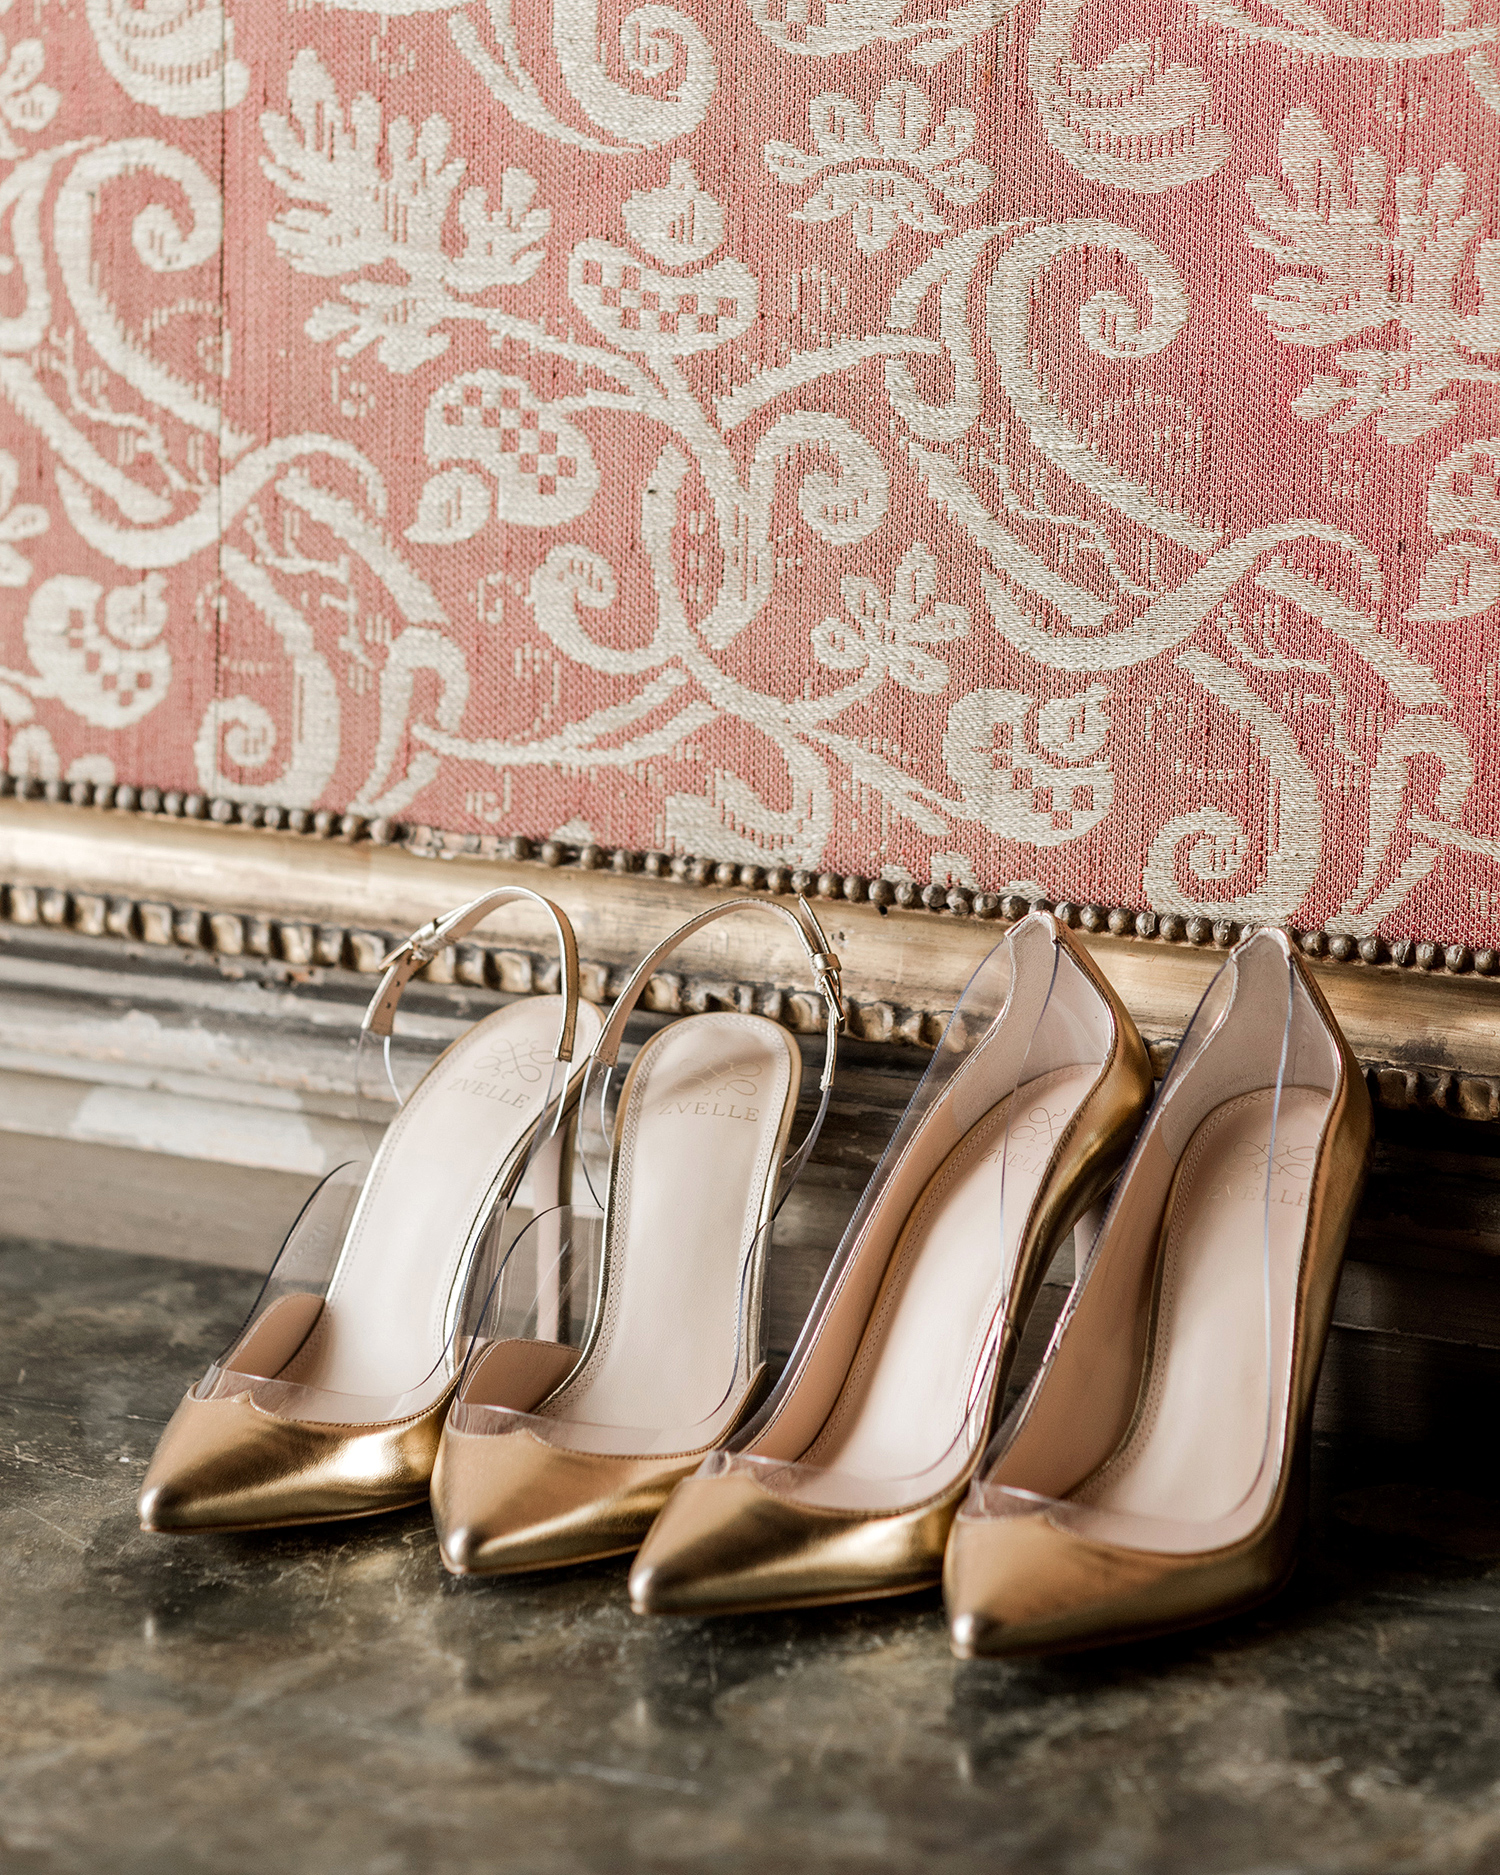 elle raymond venice wedding pairs gold pumps